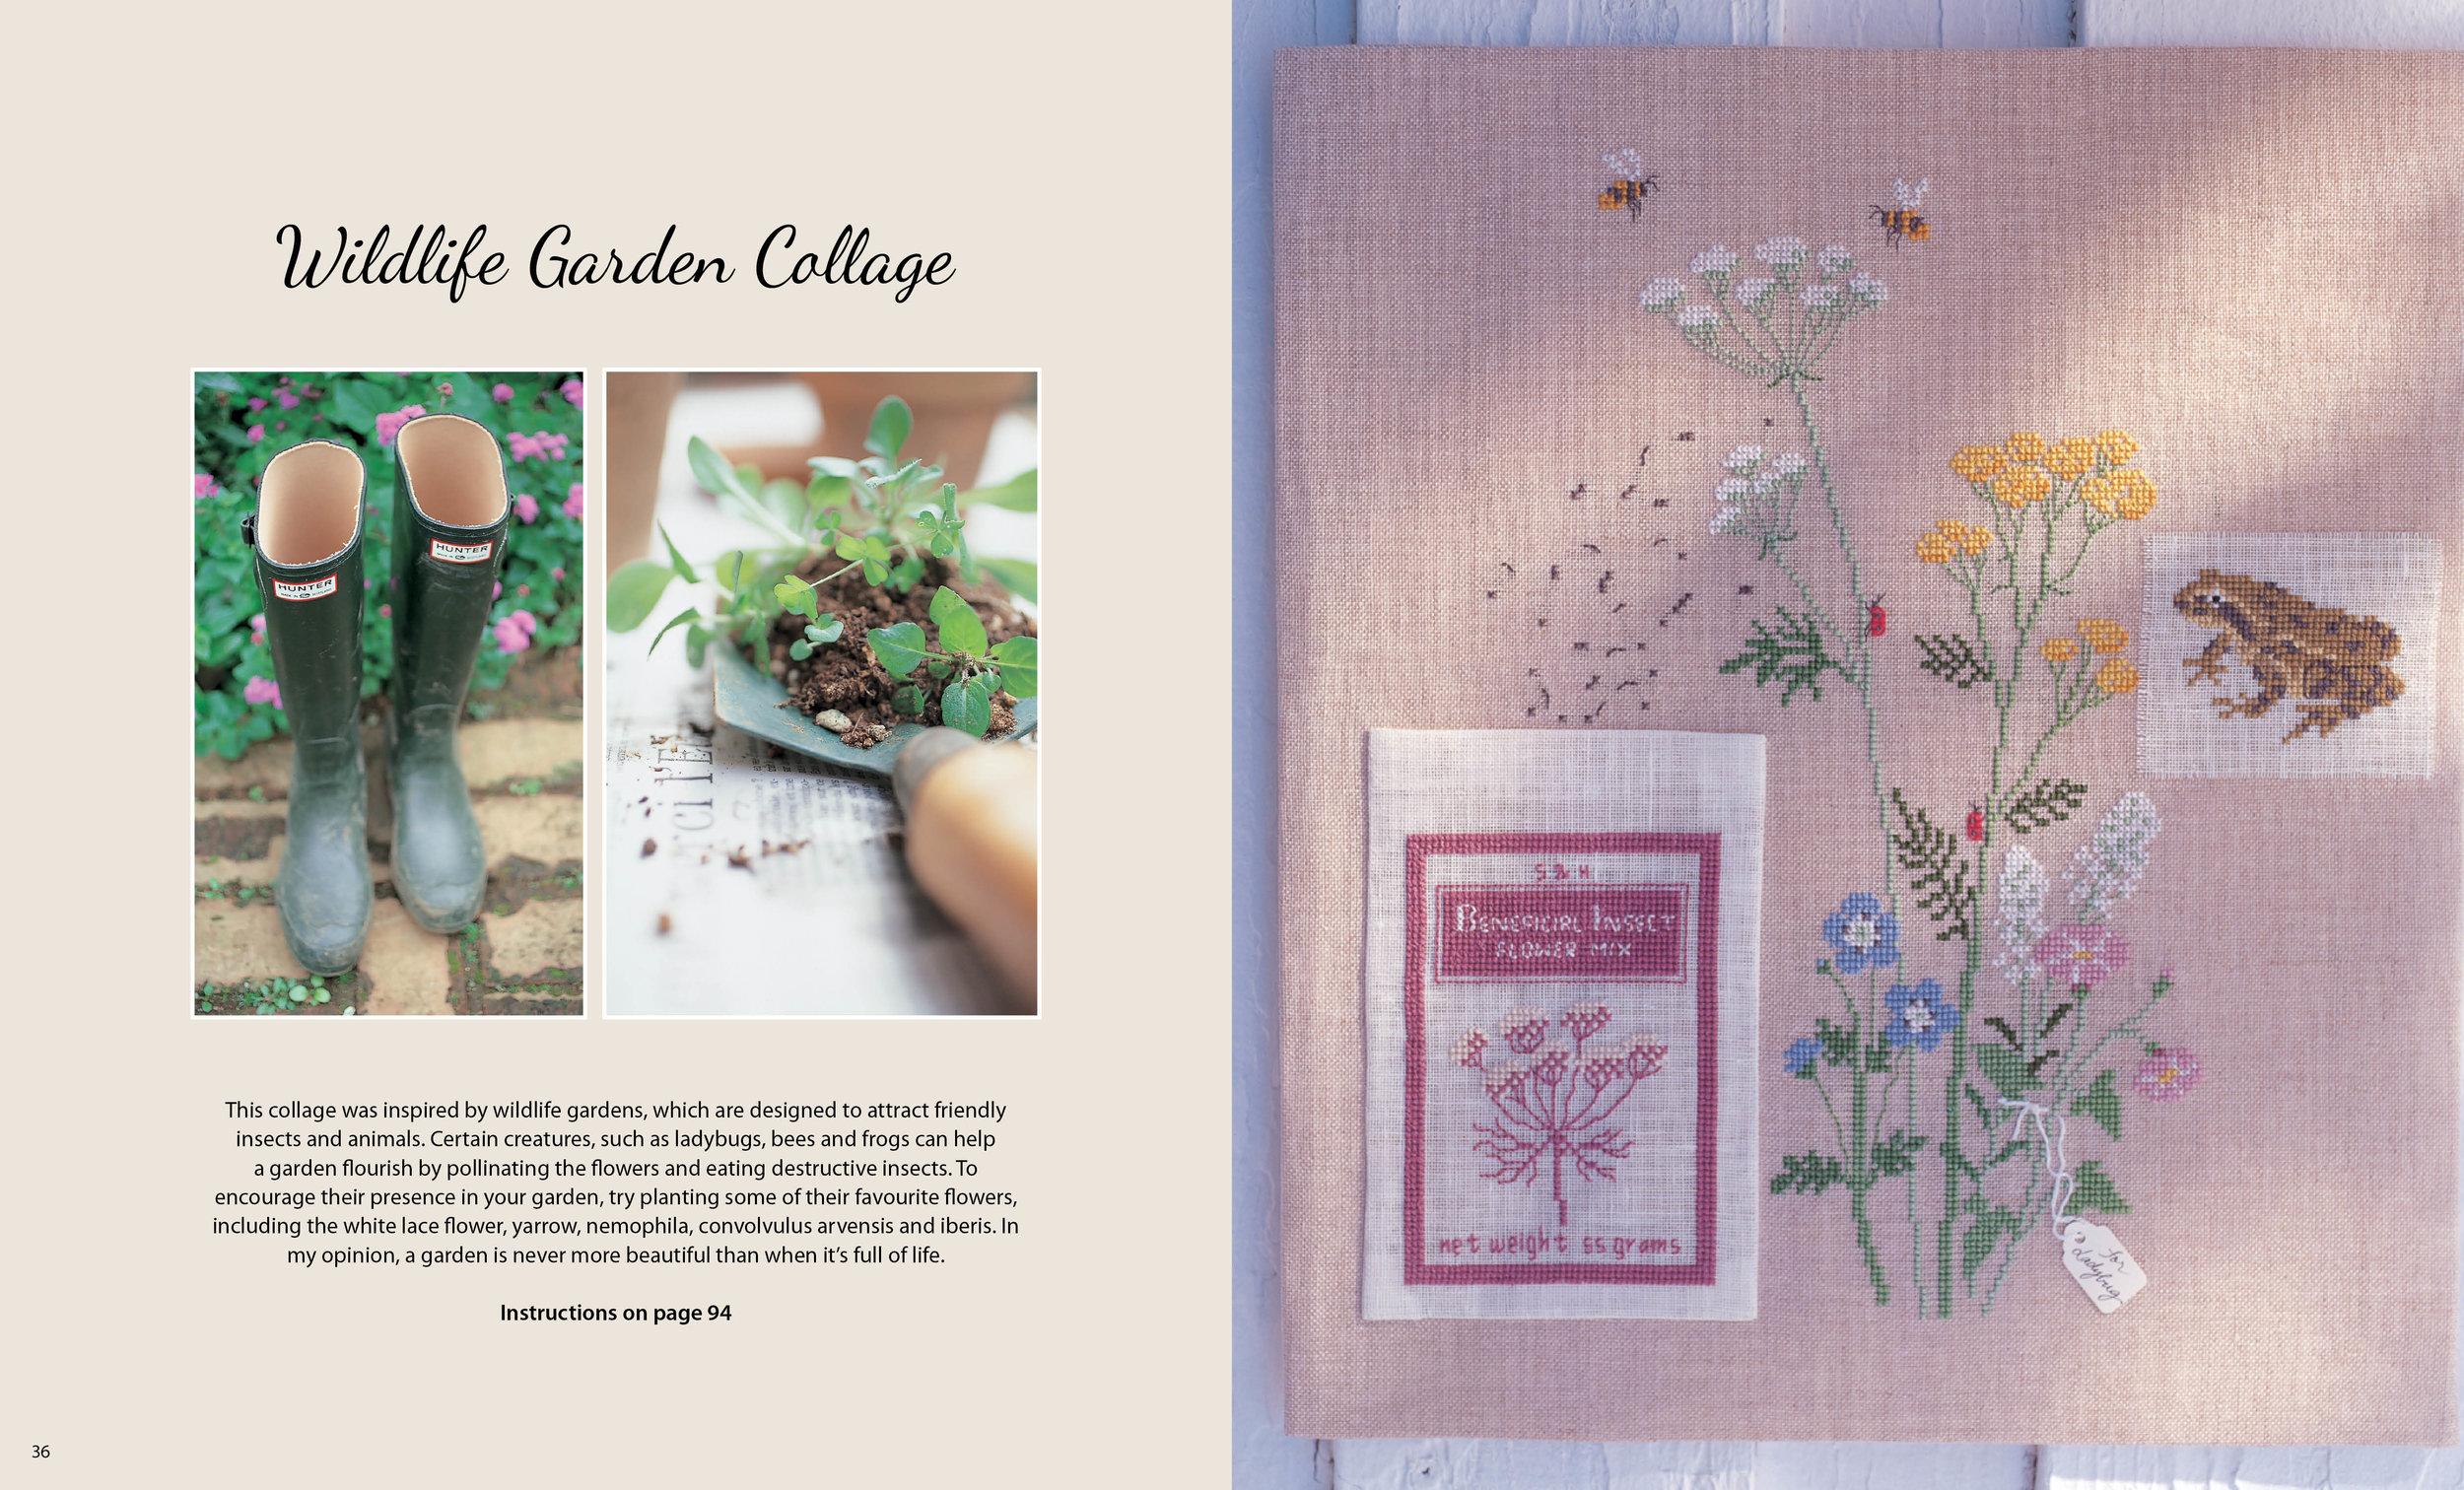 The Cross-Stitch Garden 36.37.jpg